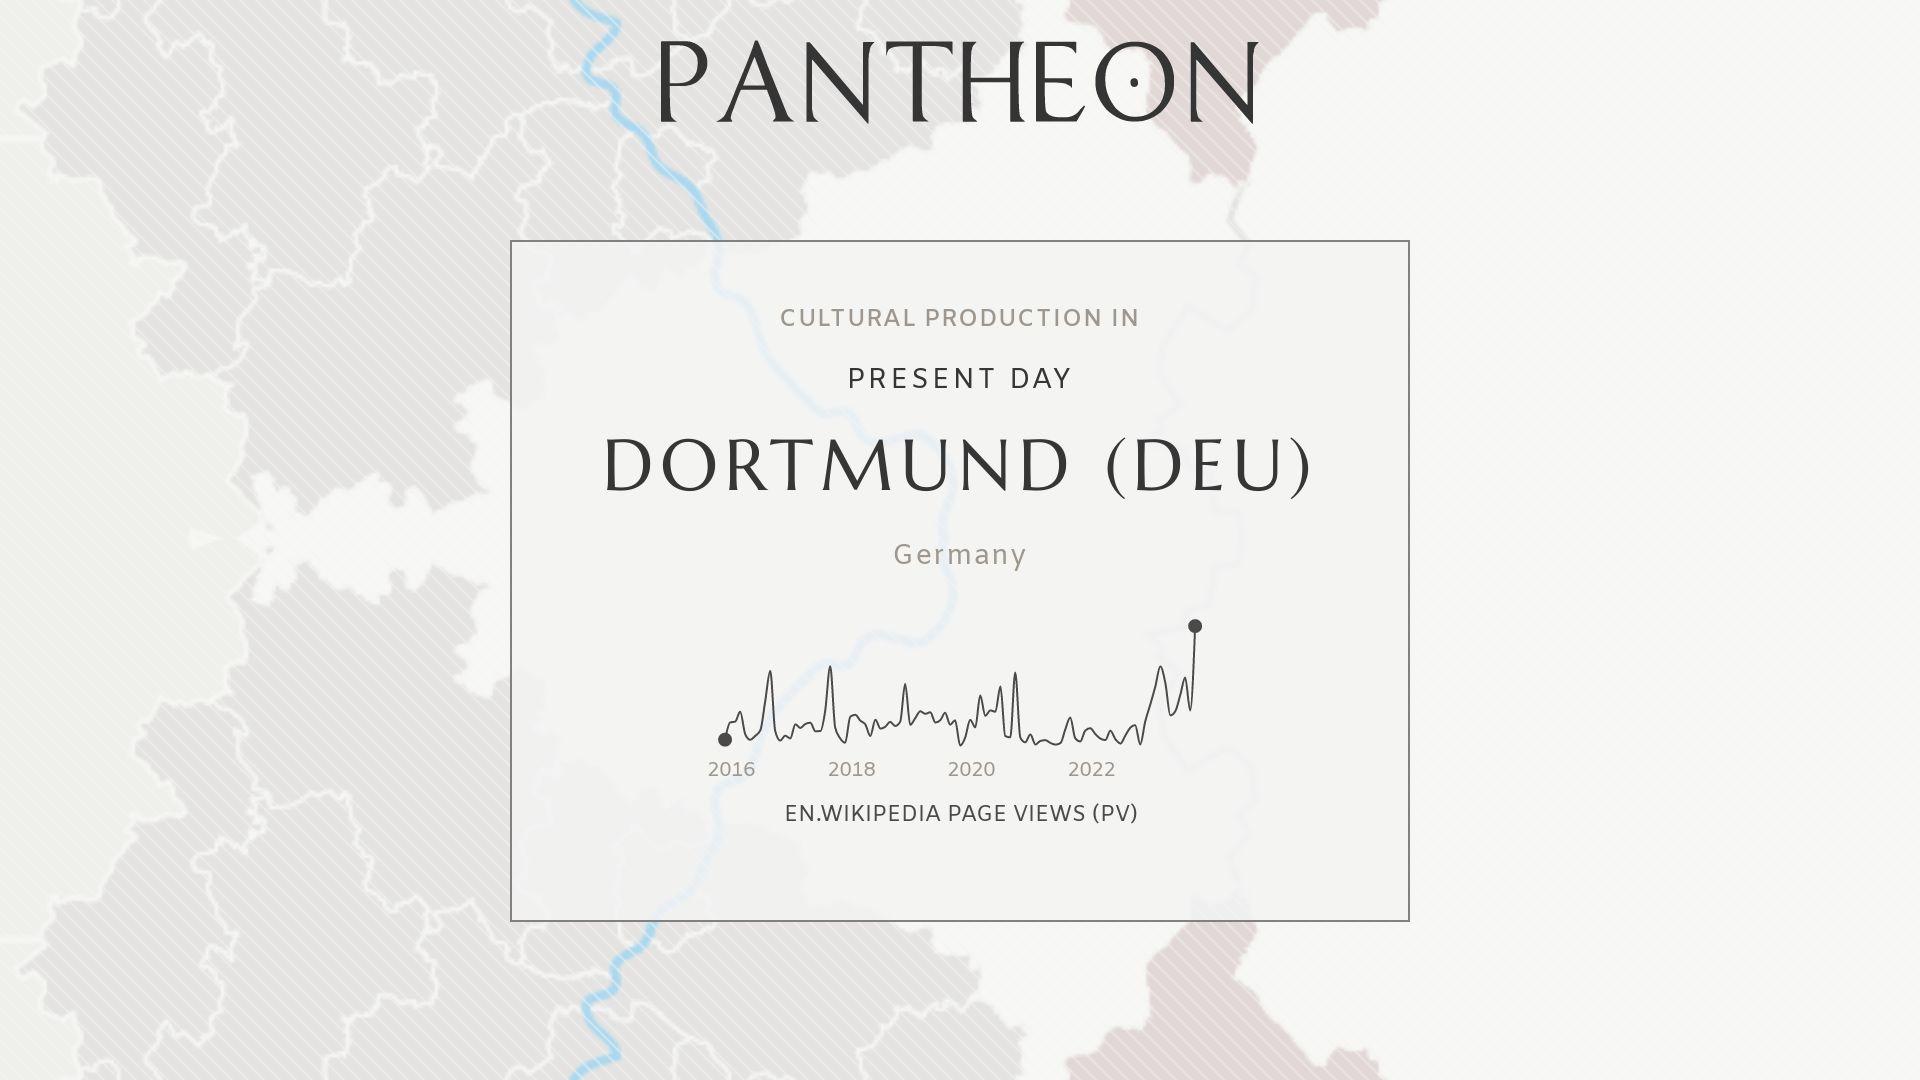 Dortmund Pantheon